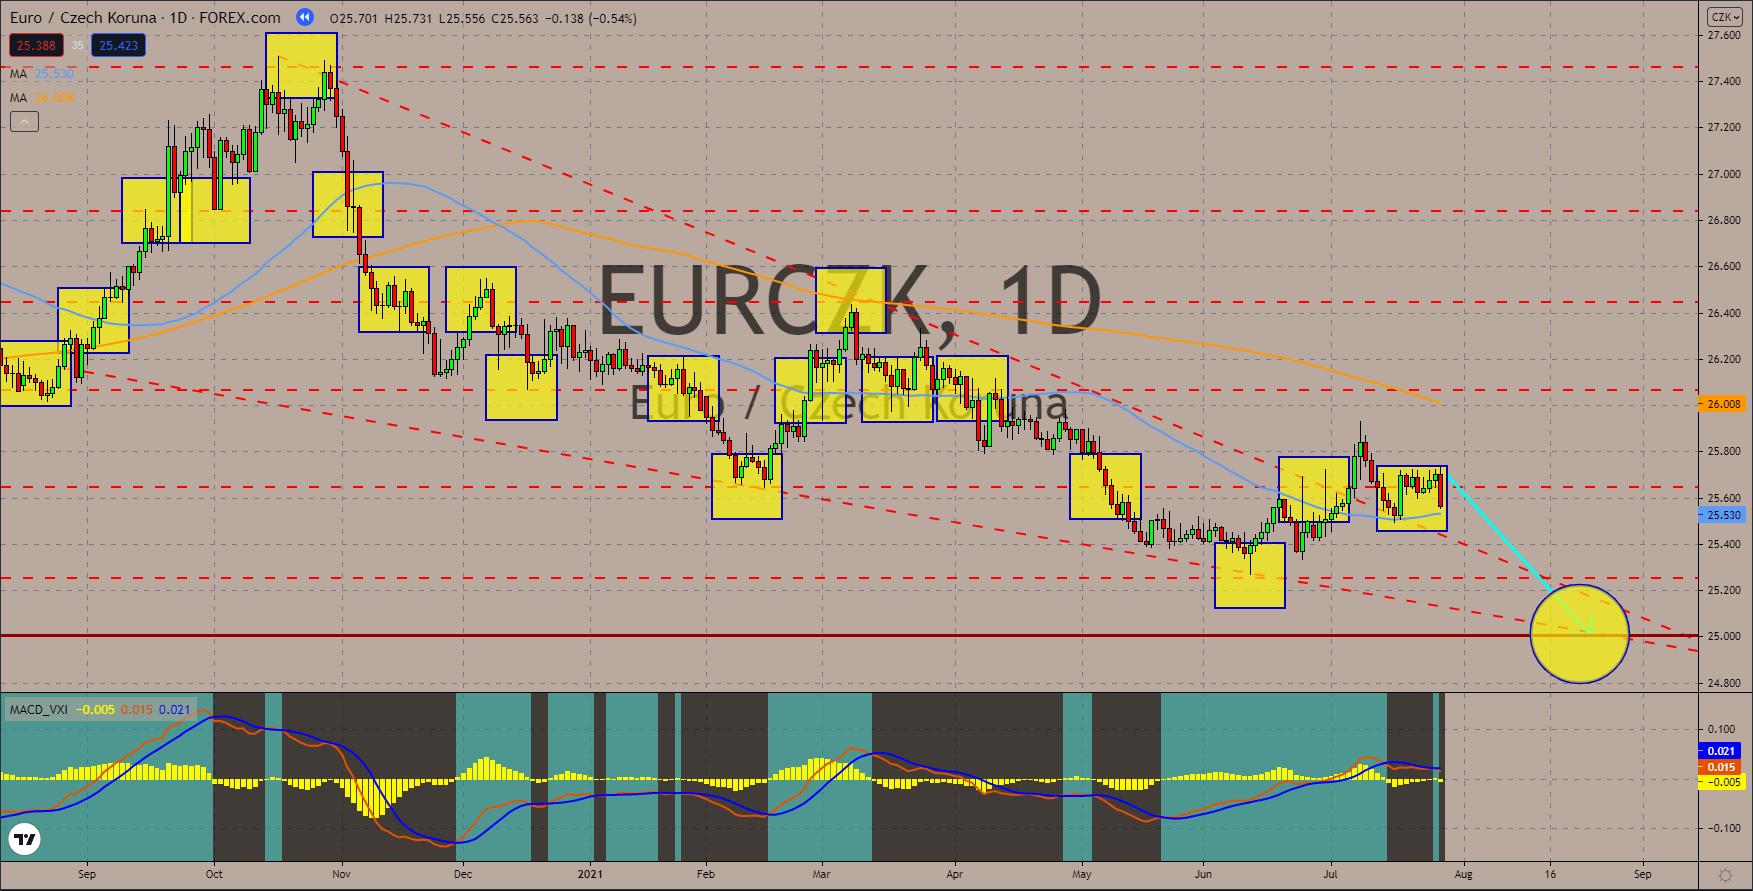 Charts, Daily Market Charts and Analysis July 29, 2021